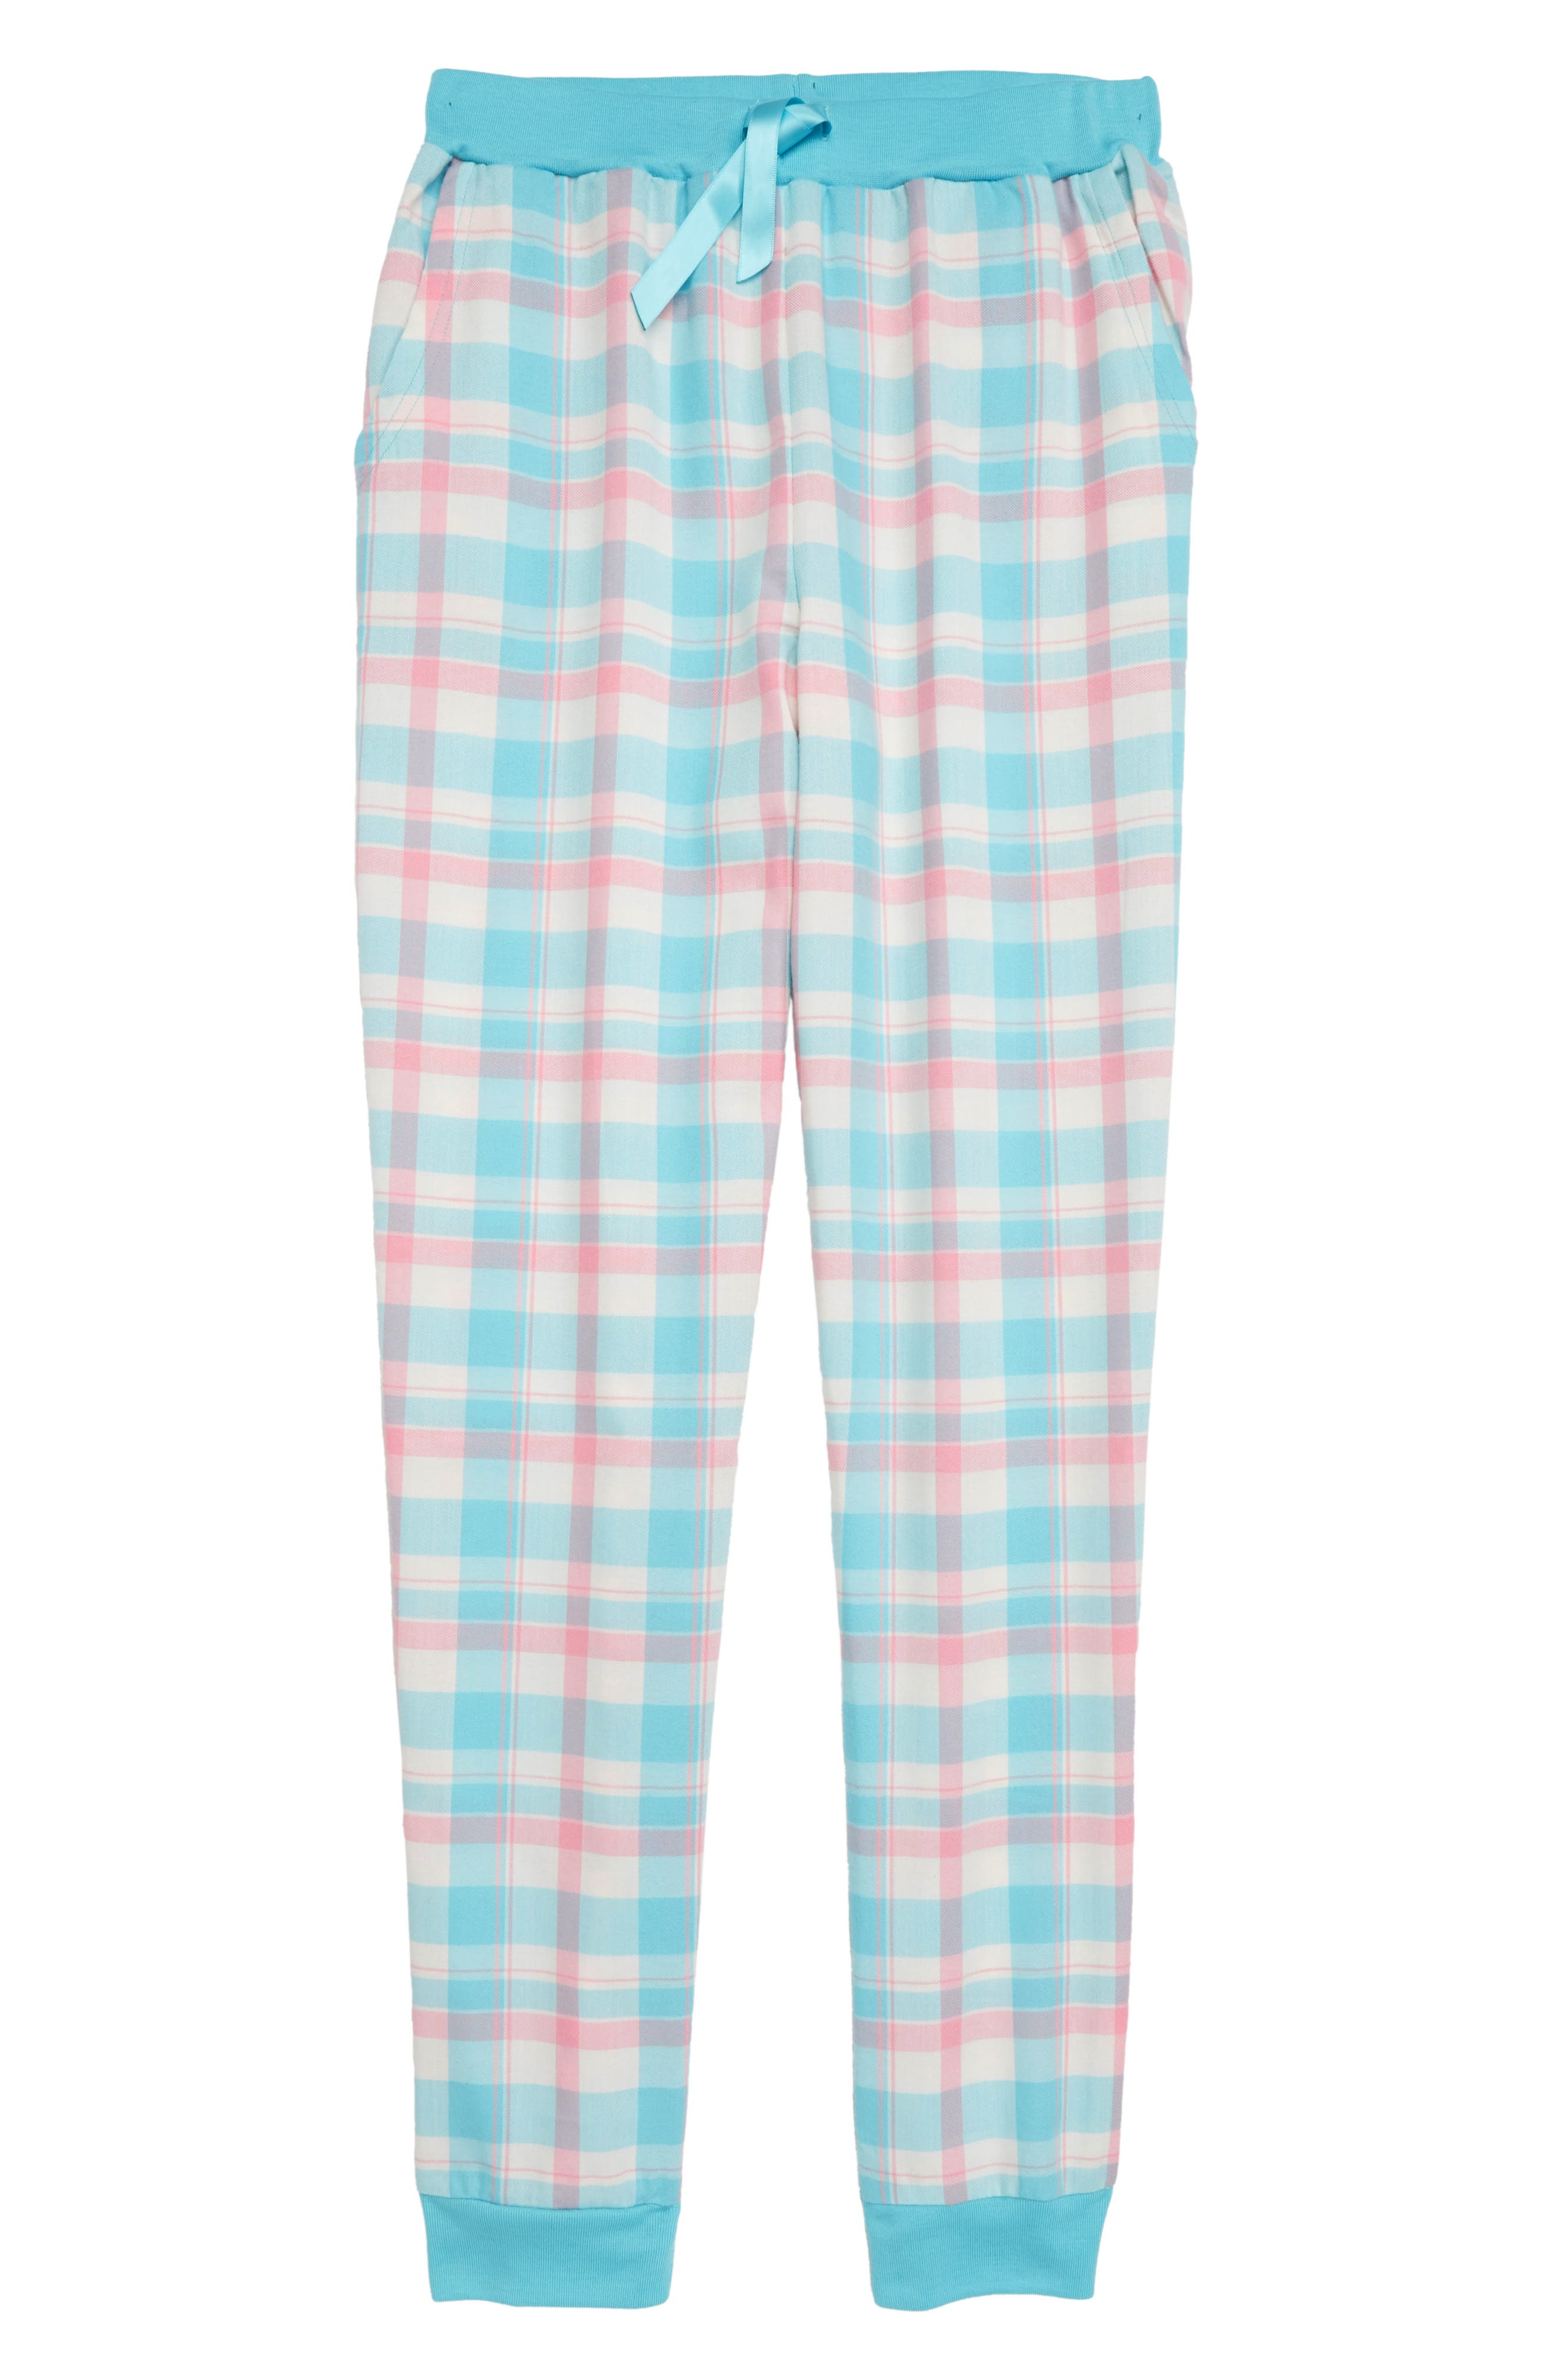 Girls Tucker  Tate Flannel Pajama Pants Size XL (1416)  Bluegreen